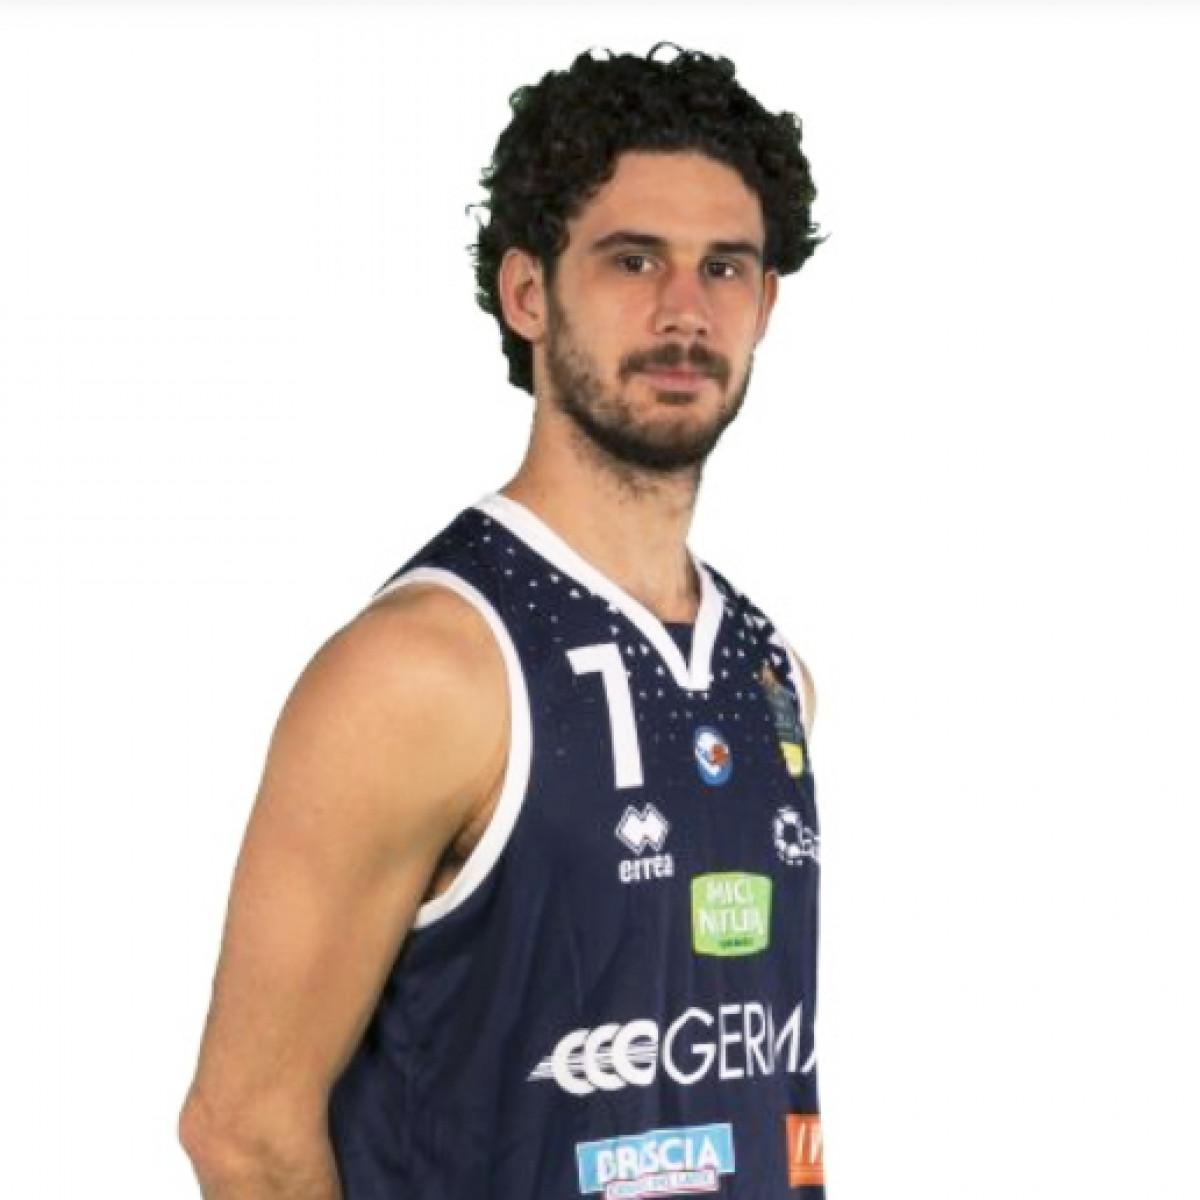 Photo of Luca Vitali, 2018-2019 season